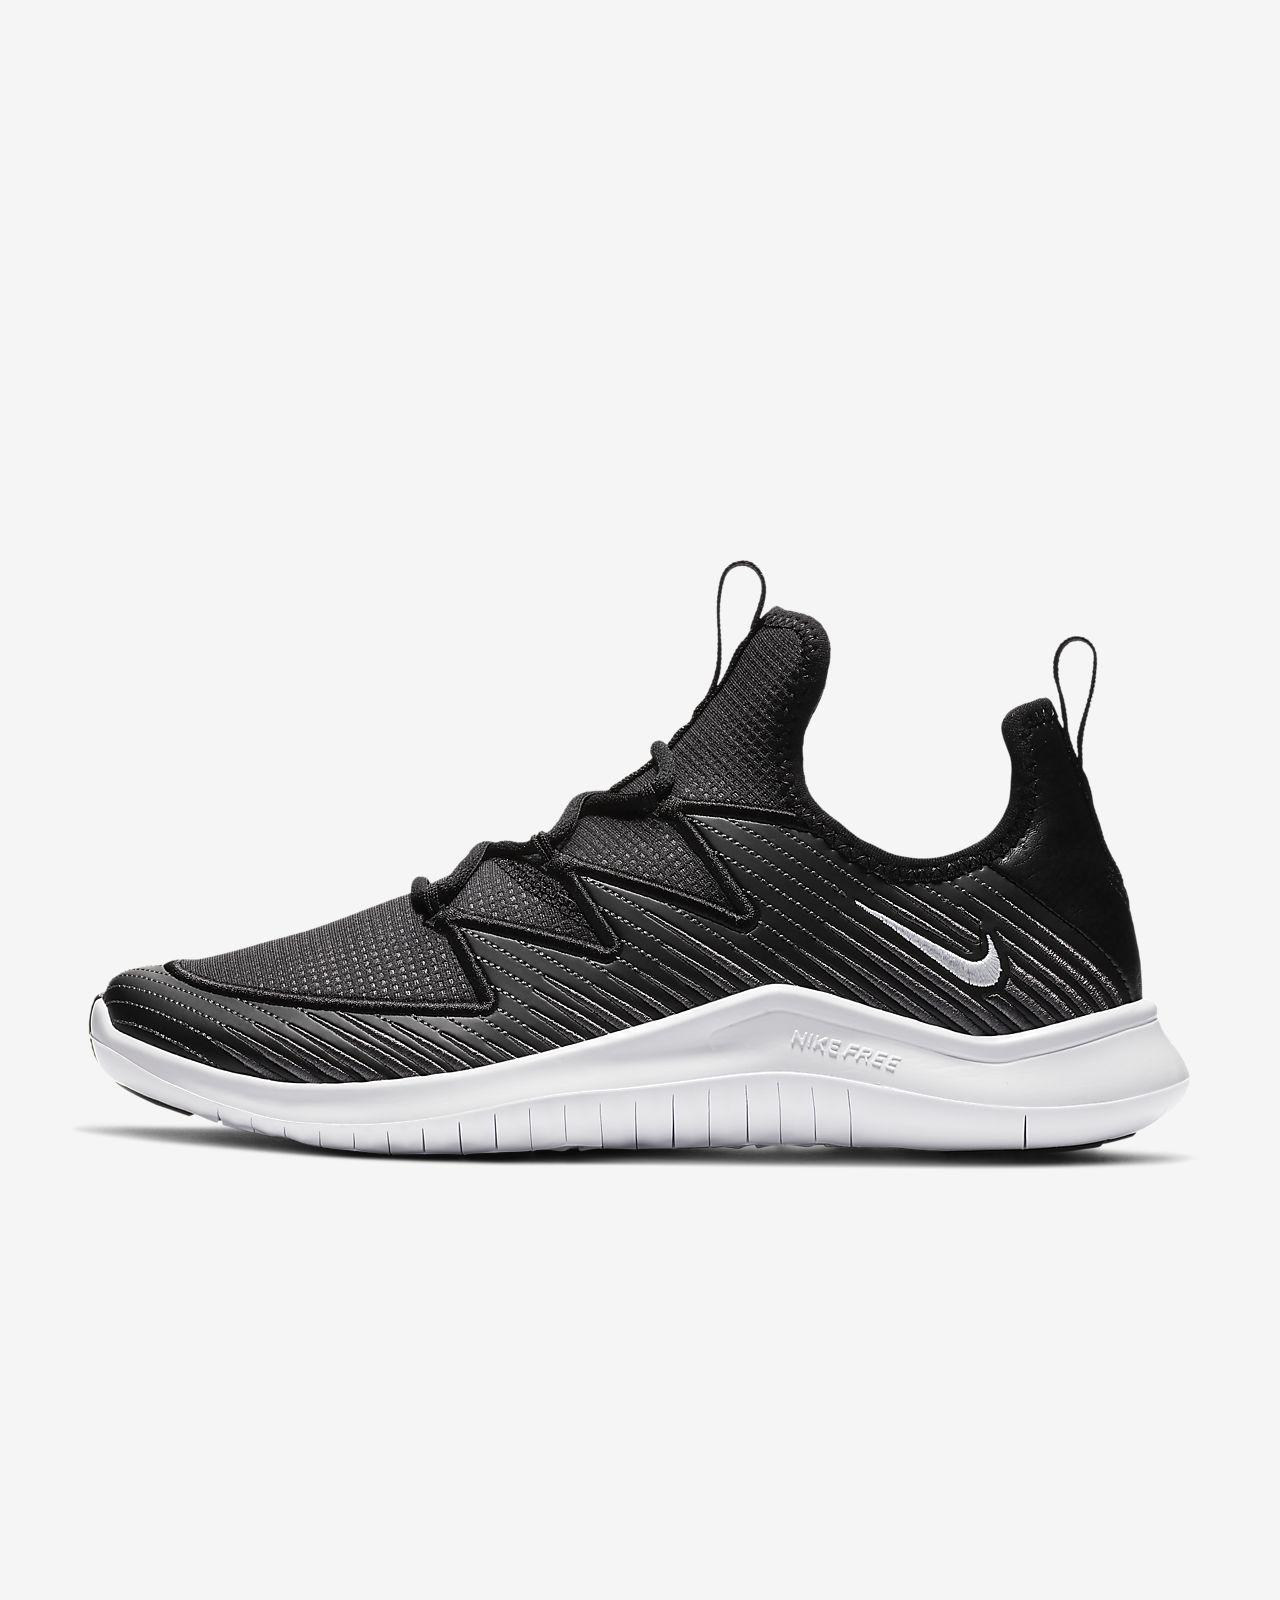 online store d4bff 8b179 ... Nike Free TR Ultra Damen-Trainingsschuh